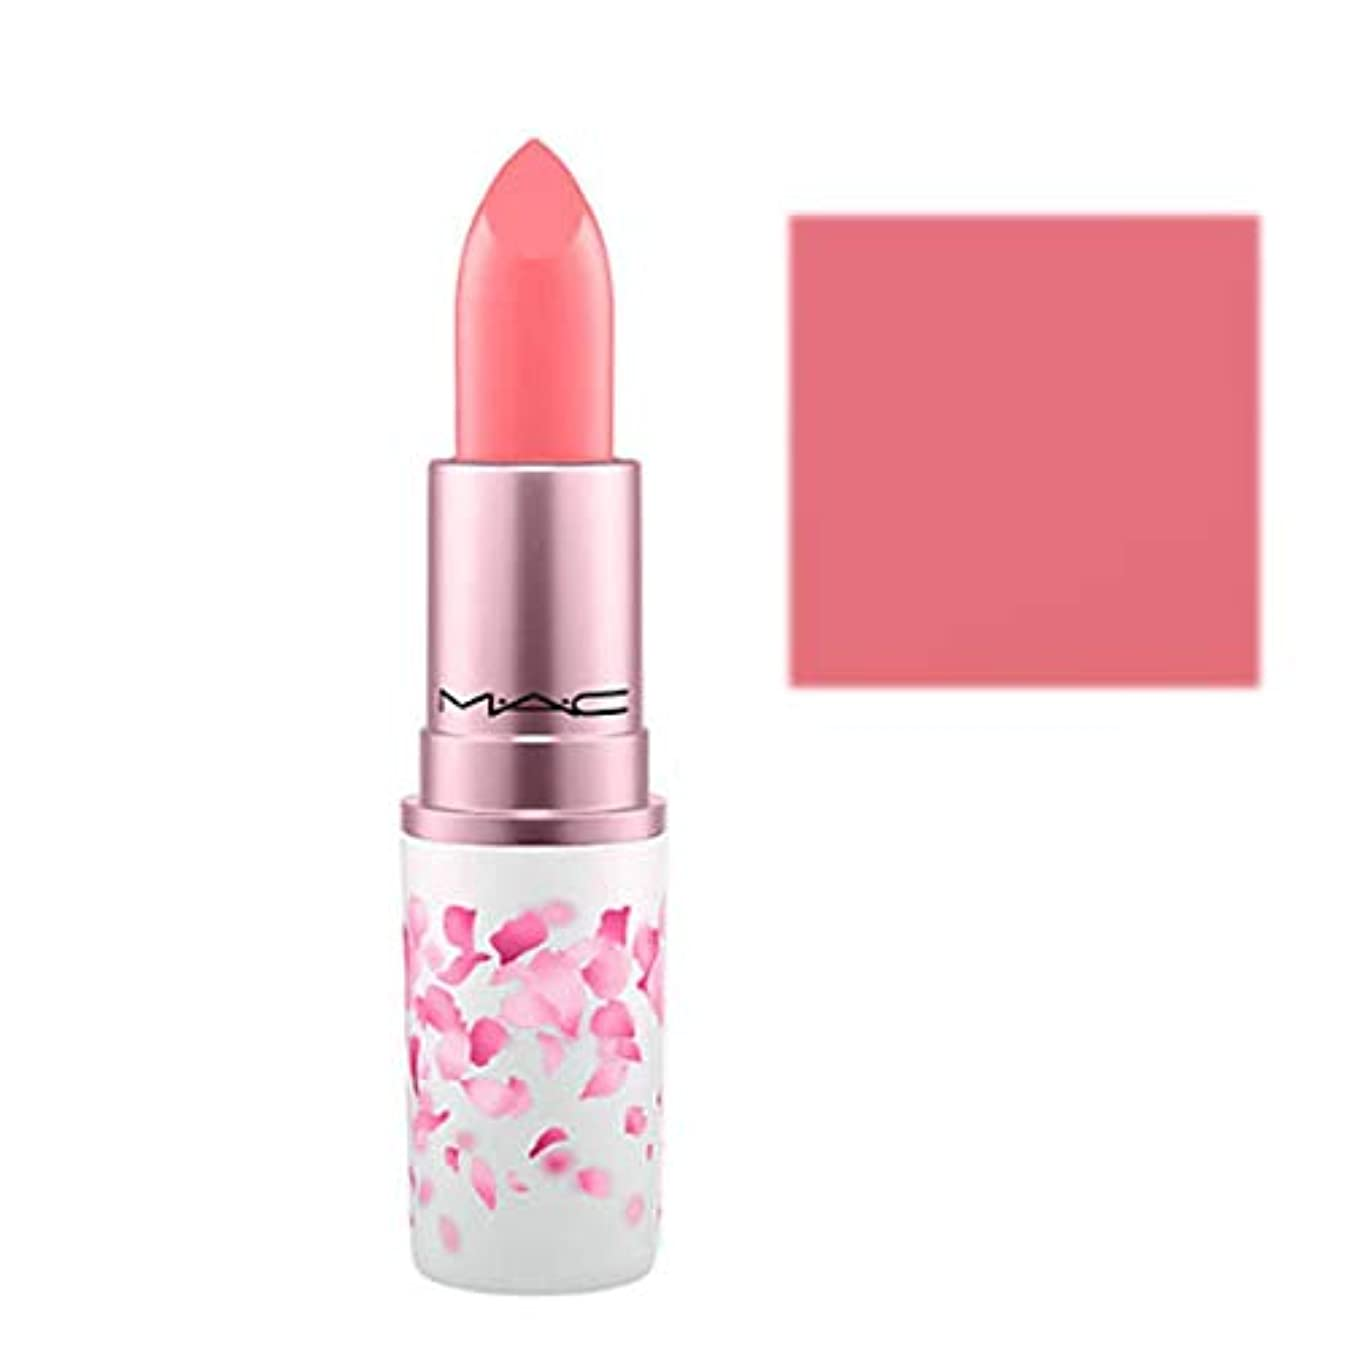 M.A.C ?マック, 限定版, 2019 Spring, Lipstick/Boom, Boom, Bloom - Hi-Fructease [海外直送品] [並行輸入品]